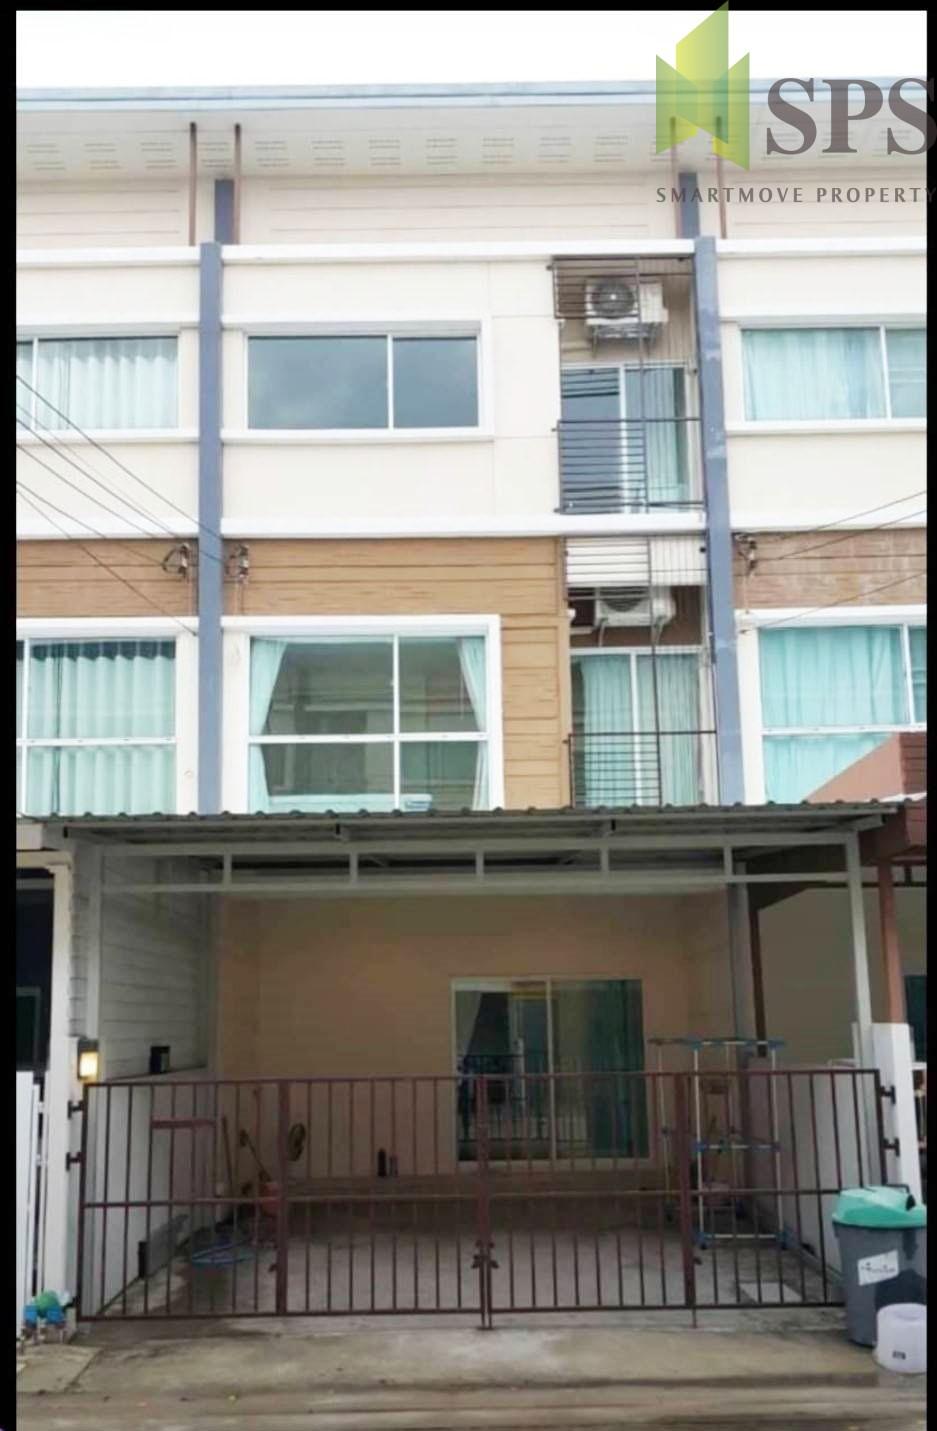 For Rent 3 storey townhouse ให้เช่าทาวน์โฮม3ชั้น หมู่บ้านวิลเลตซิตี้ พัฒนาการ 38 (Property ID: SPS-PA221)